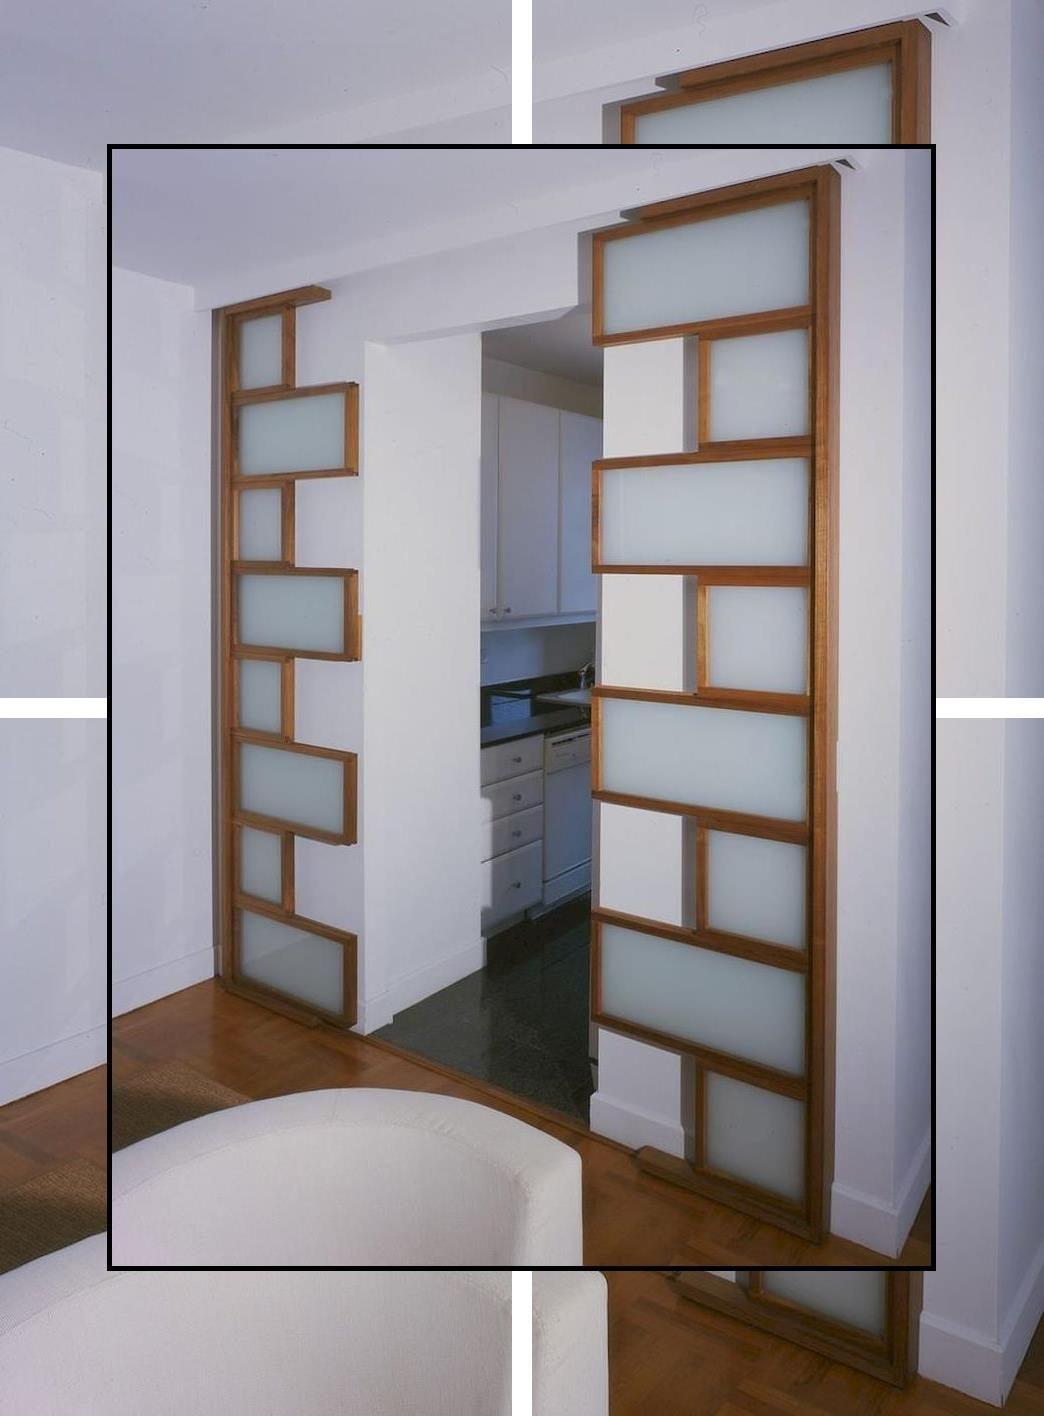 Modern Interior Sliding Doors Modern Internal Sliding Doors Residential Entry Doors Interior Panel Doors Double Doors Interior Doors Interior